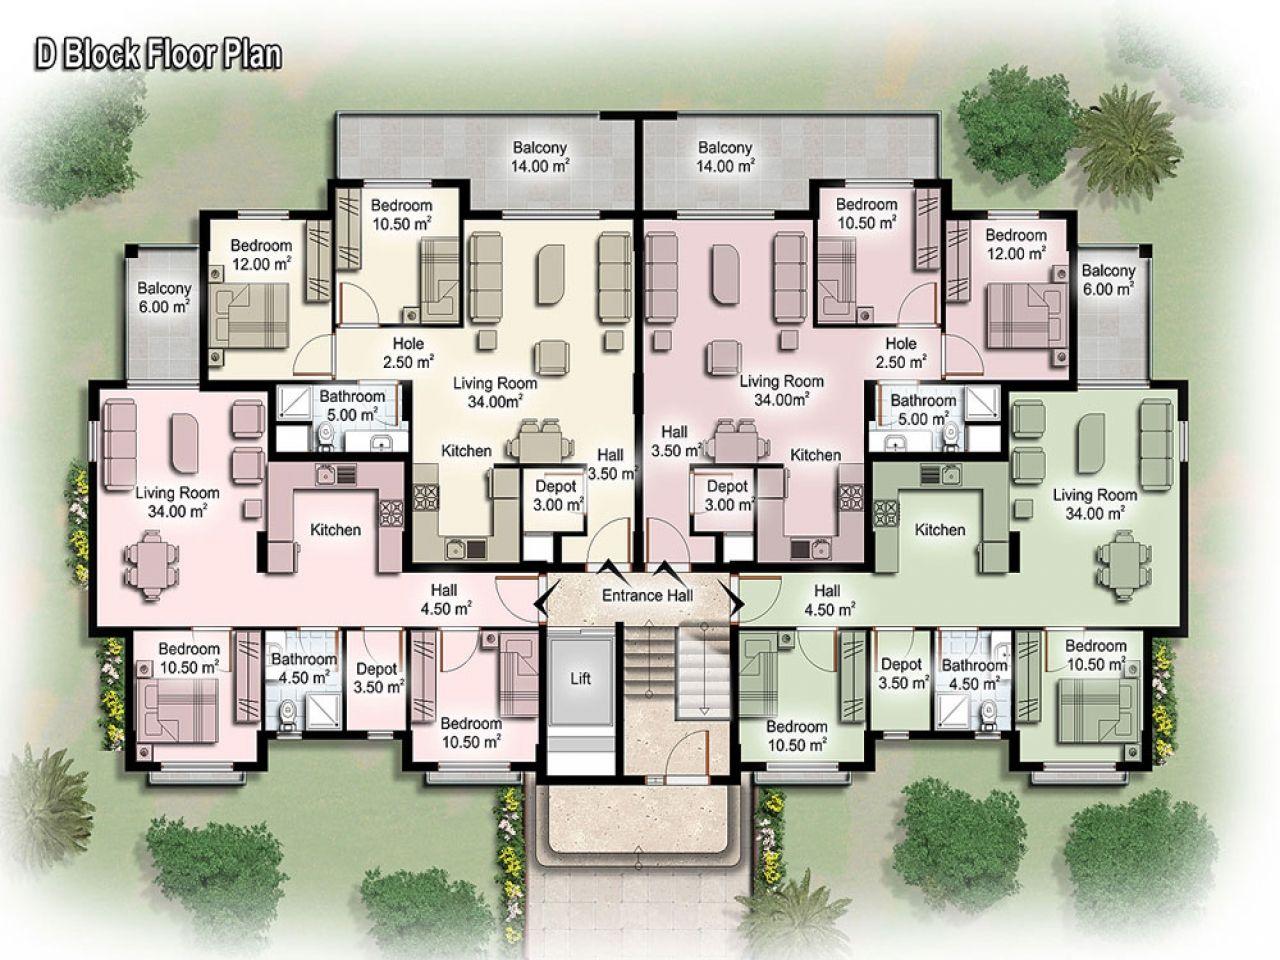 Icymi Home Design Software Building Blocks Free Download Rose Ctg Apts In 2019 Apartment Floor Plans Modern Floor Plans Apartment Plans